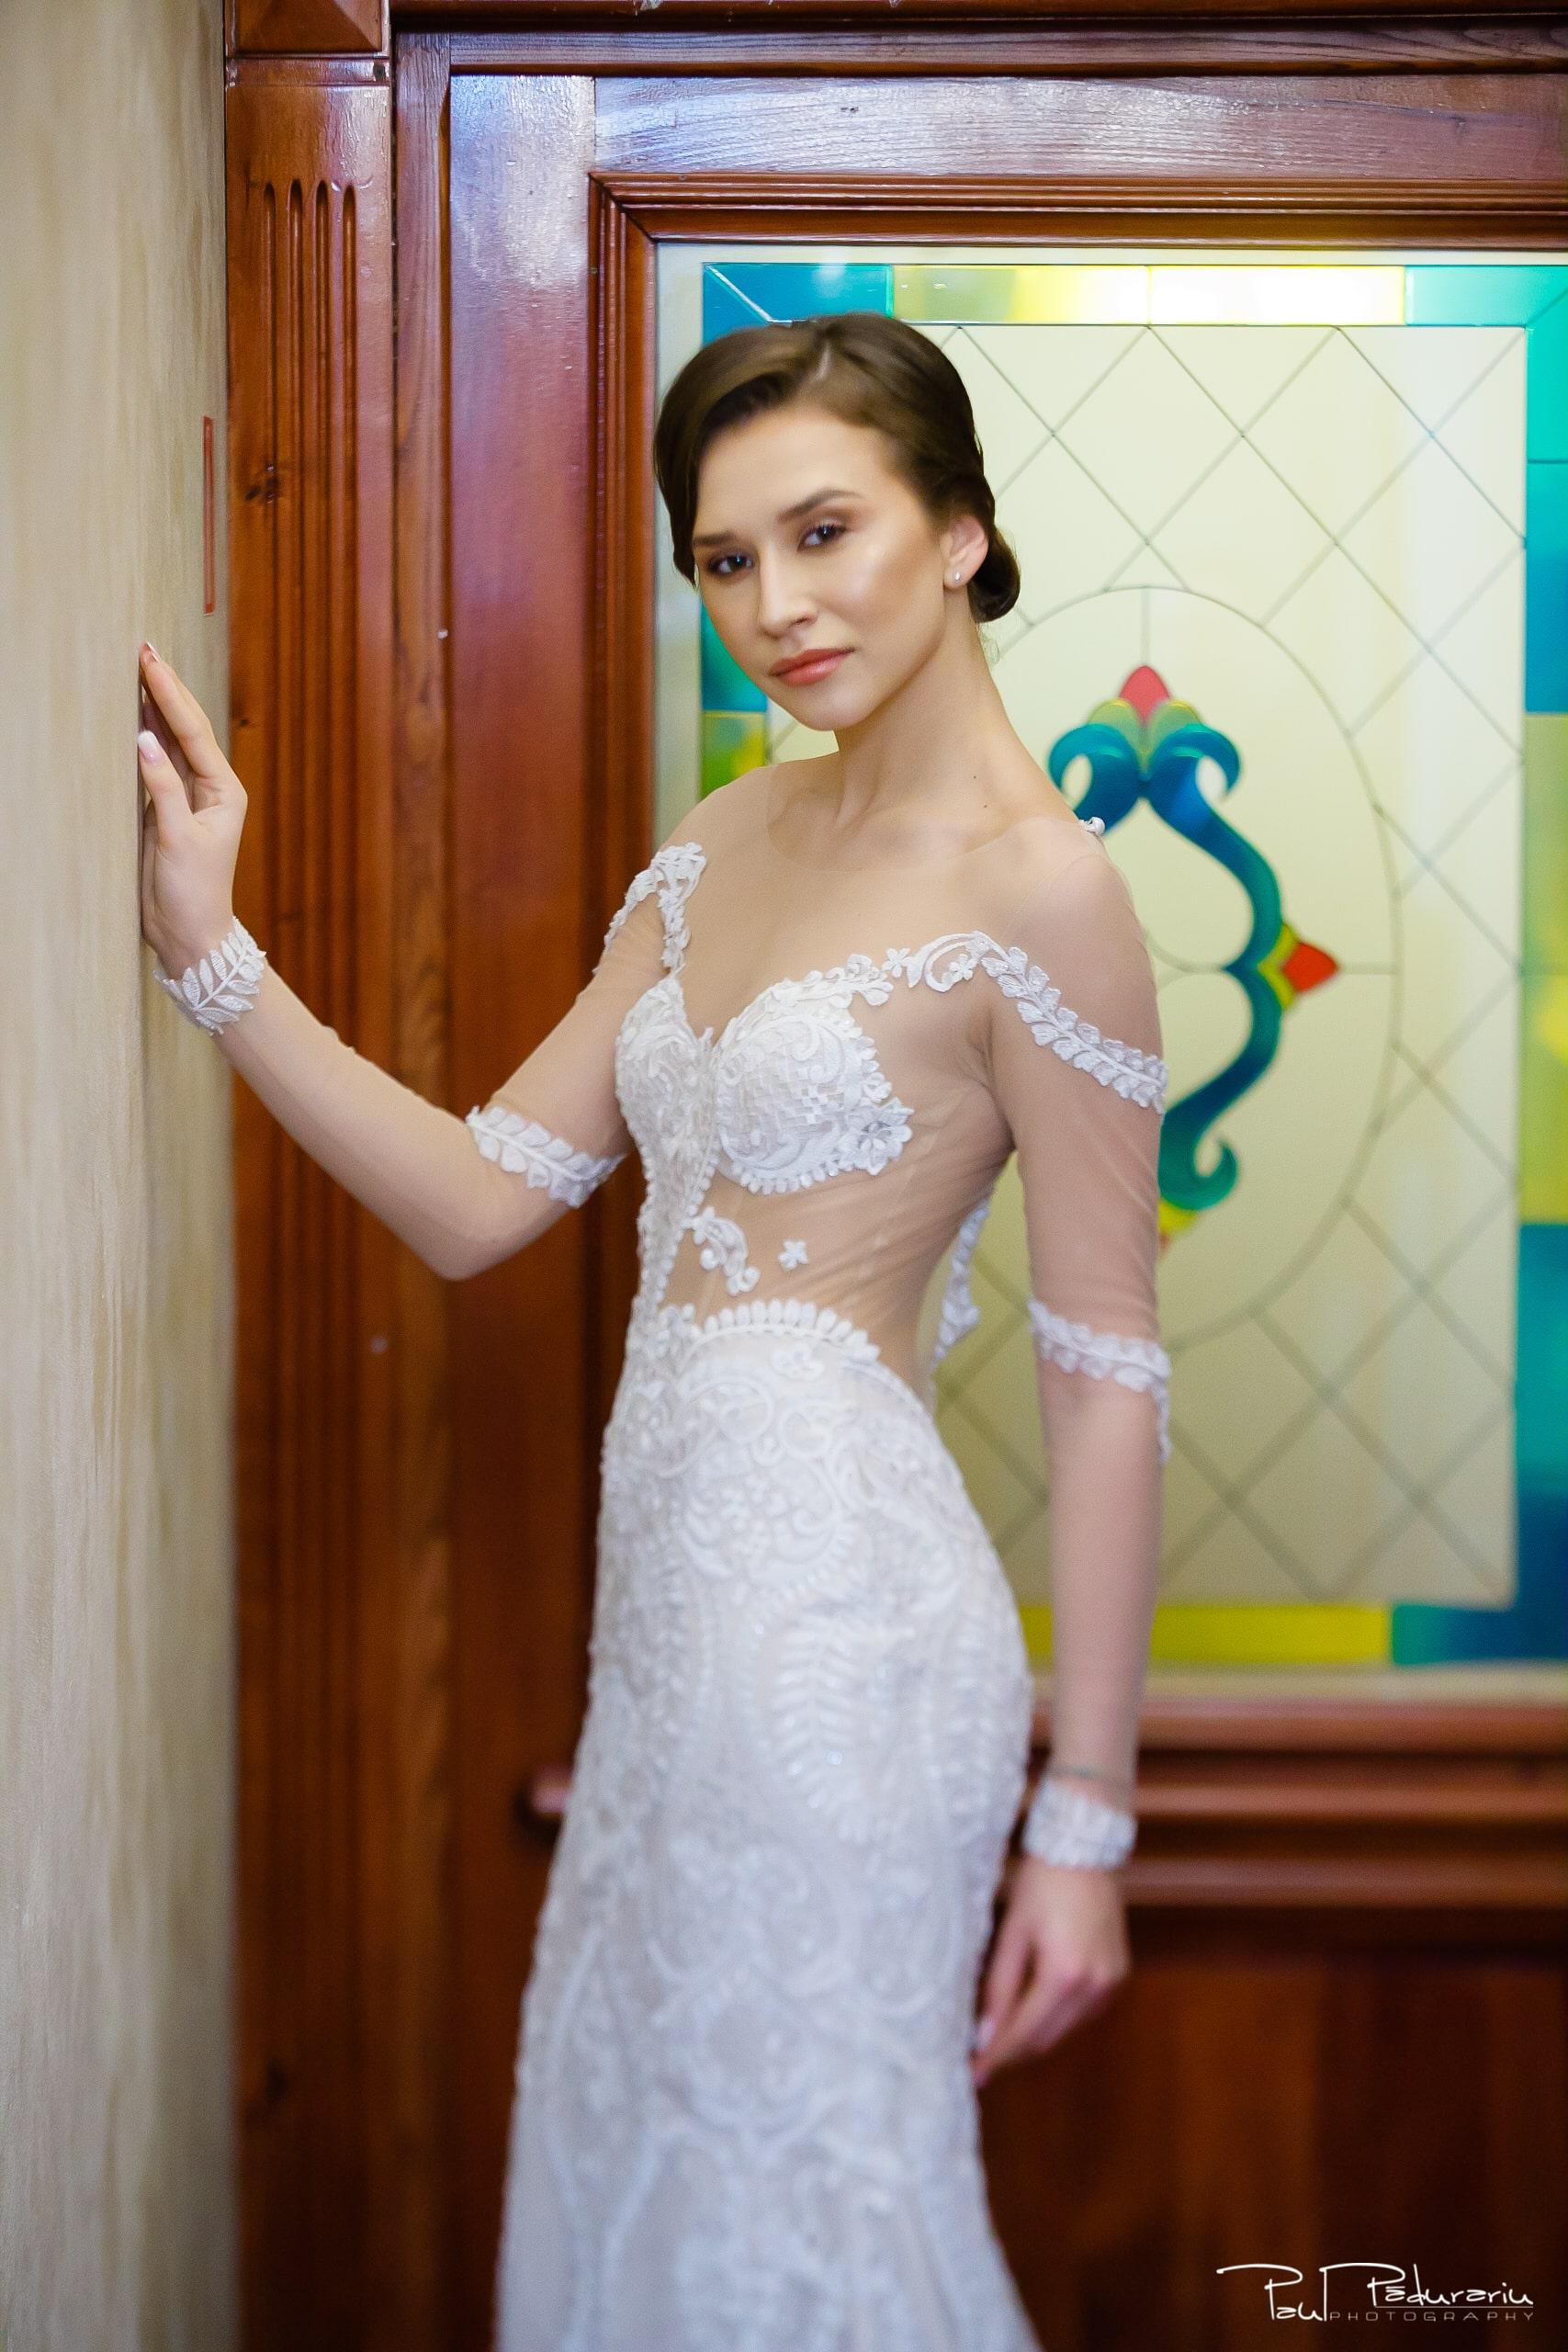 Modern Bride Edith Val colectie rochie mireasa 2019 - fotograf profesionist iasi paul padurariu | nunta iasi 10